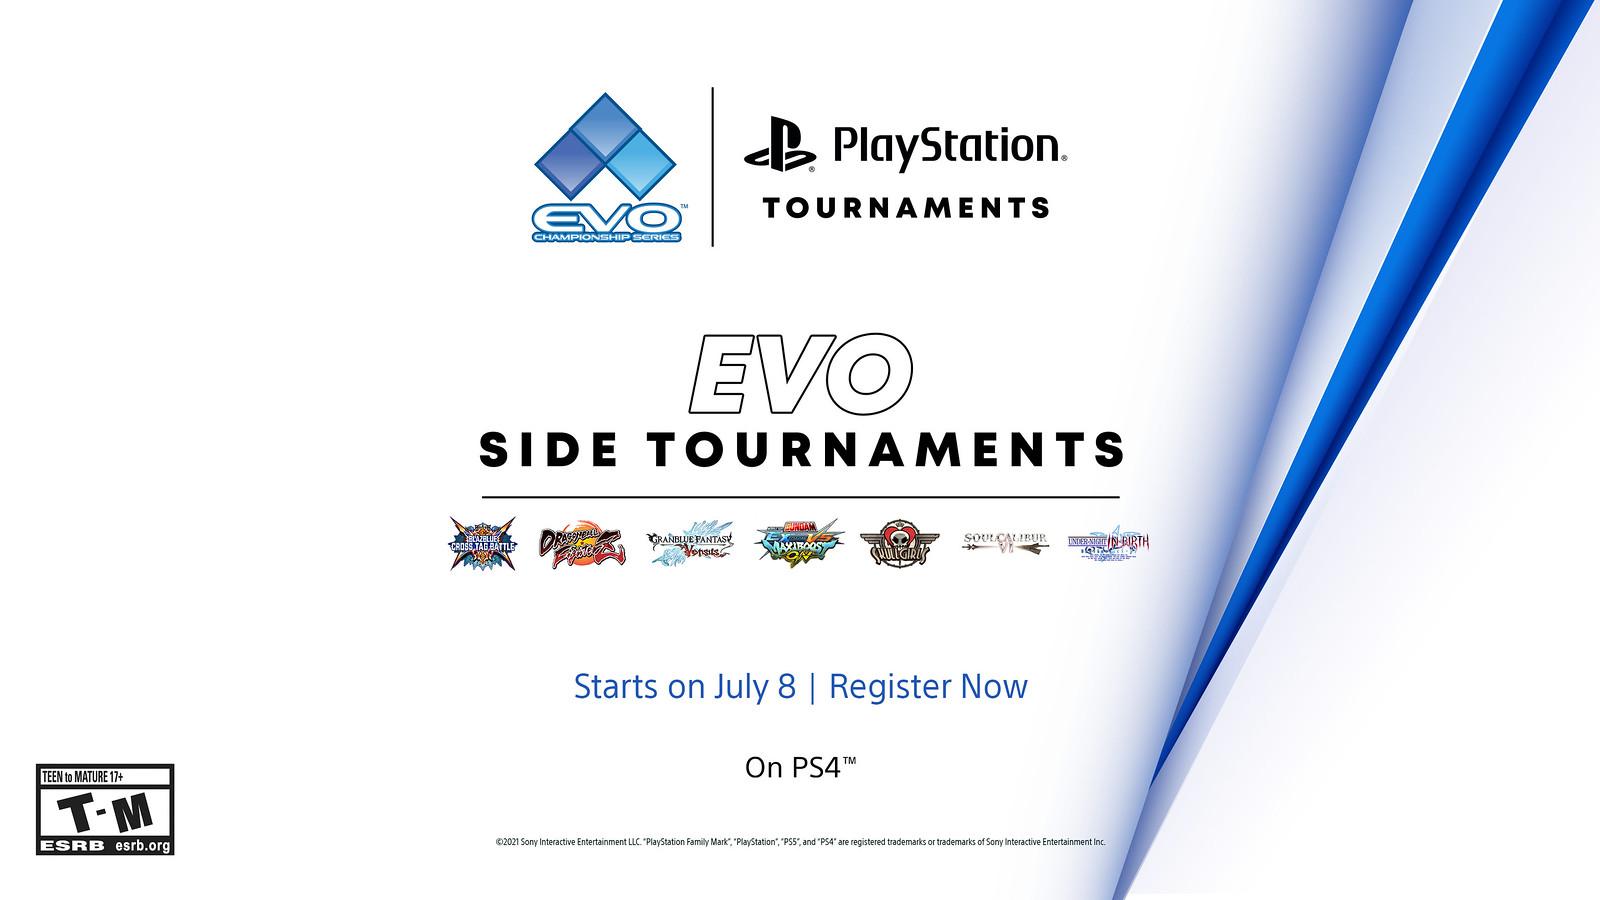 Evo & PS4 Community Series